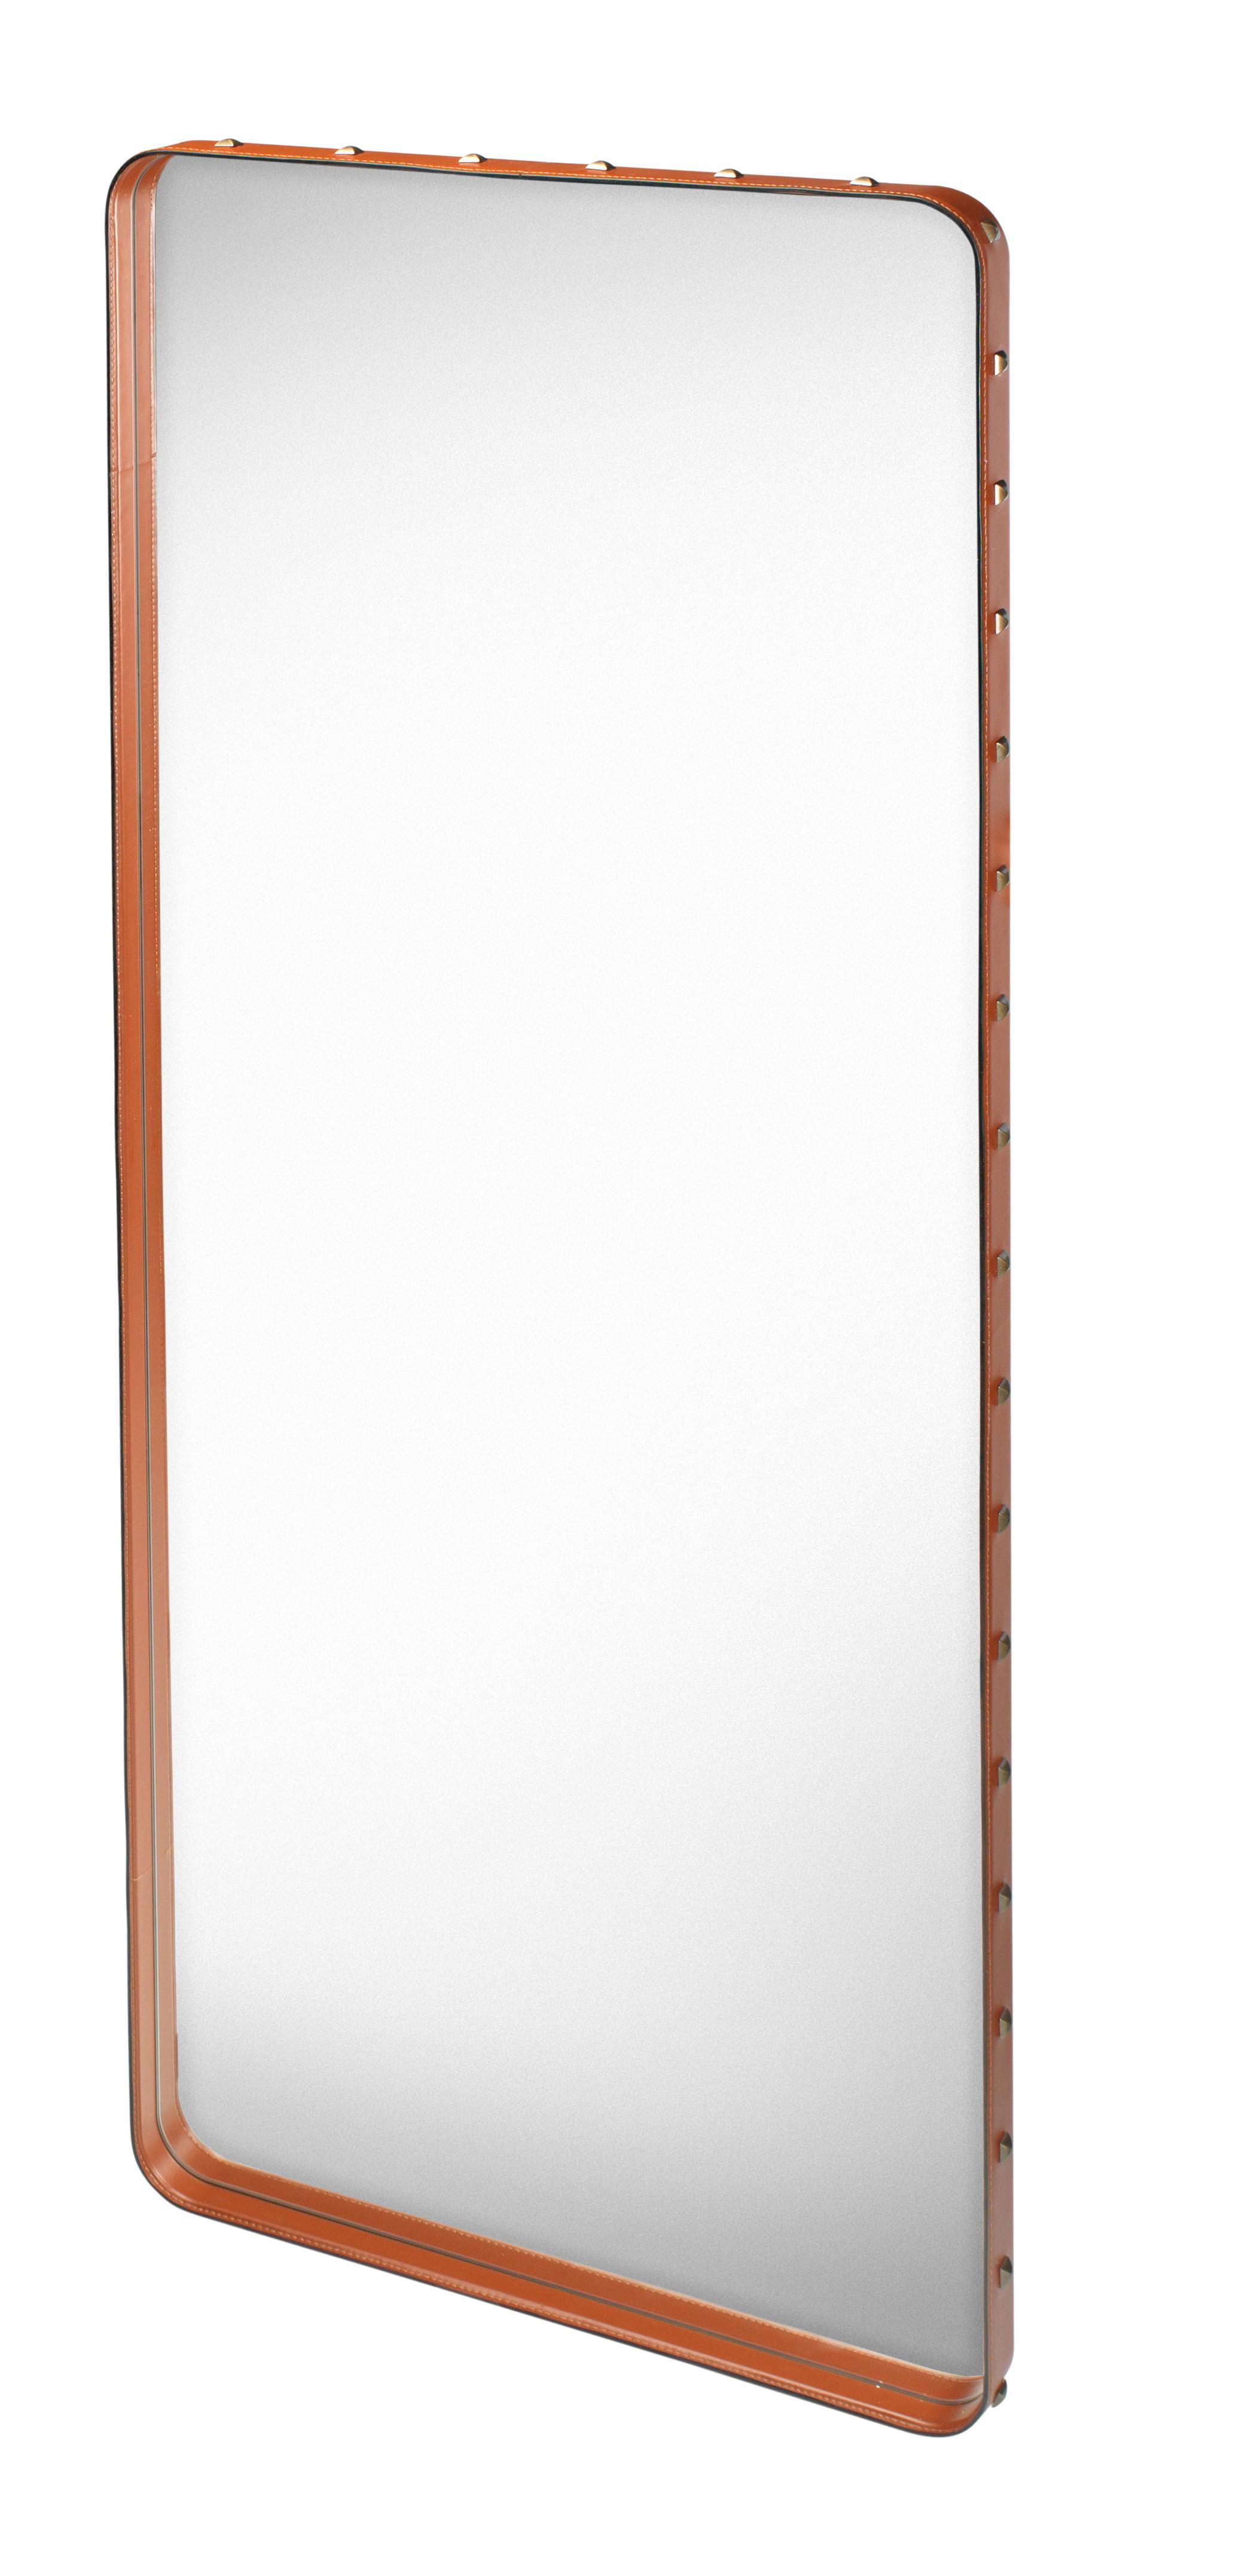 Miroir mural adnet 115 x 70 cm r dition 50 39 cuir for Miroir 50 x 75